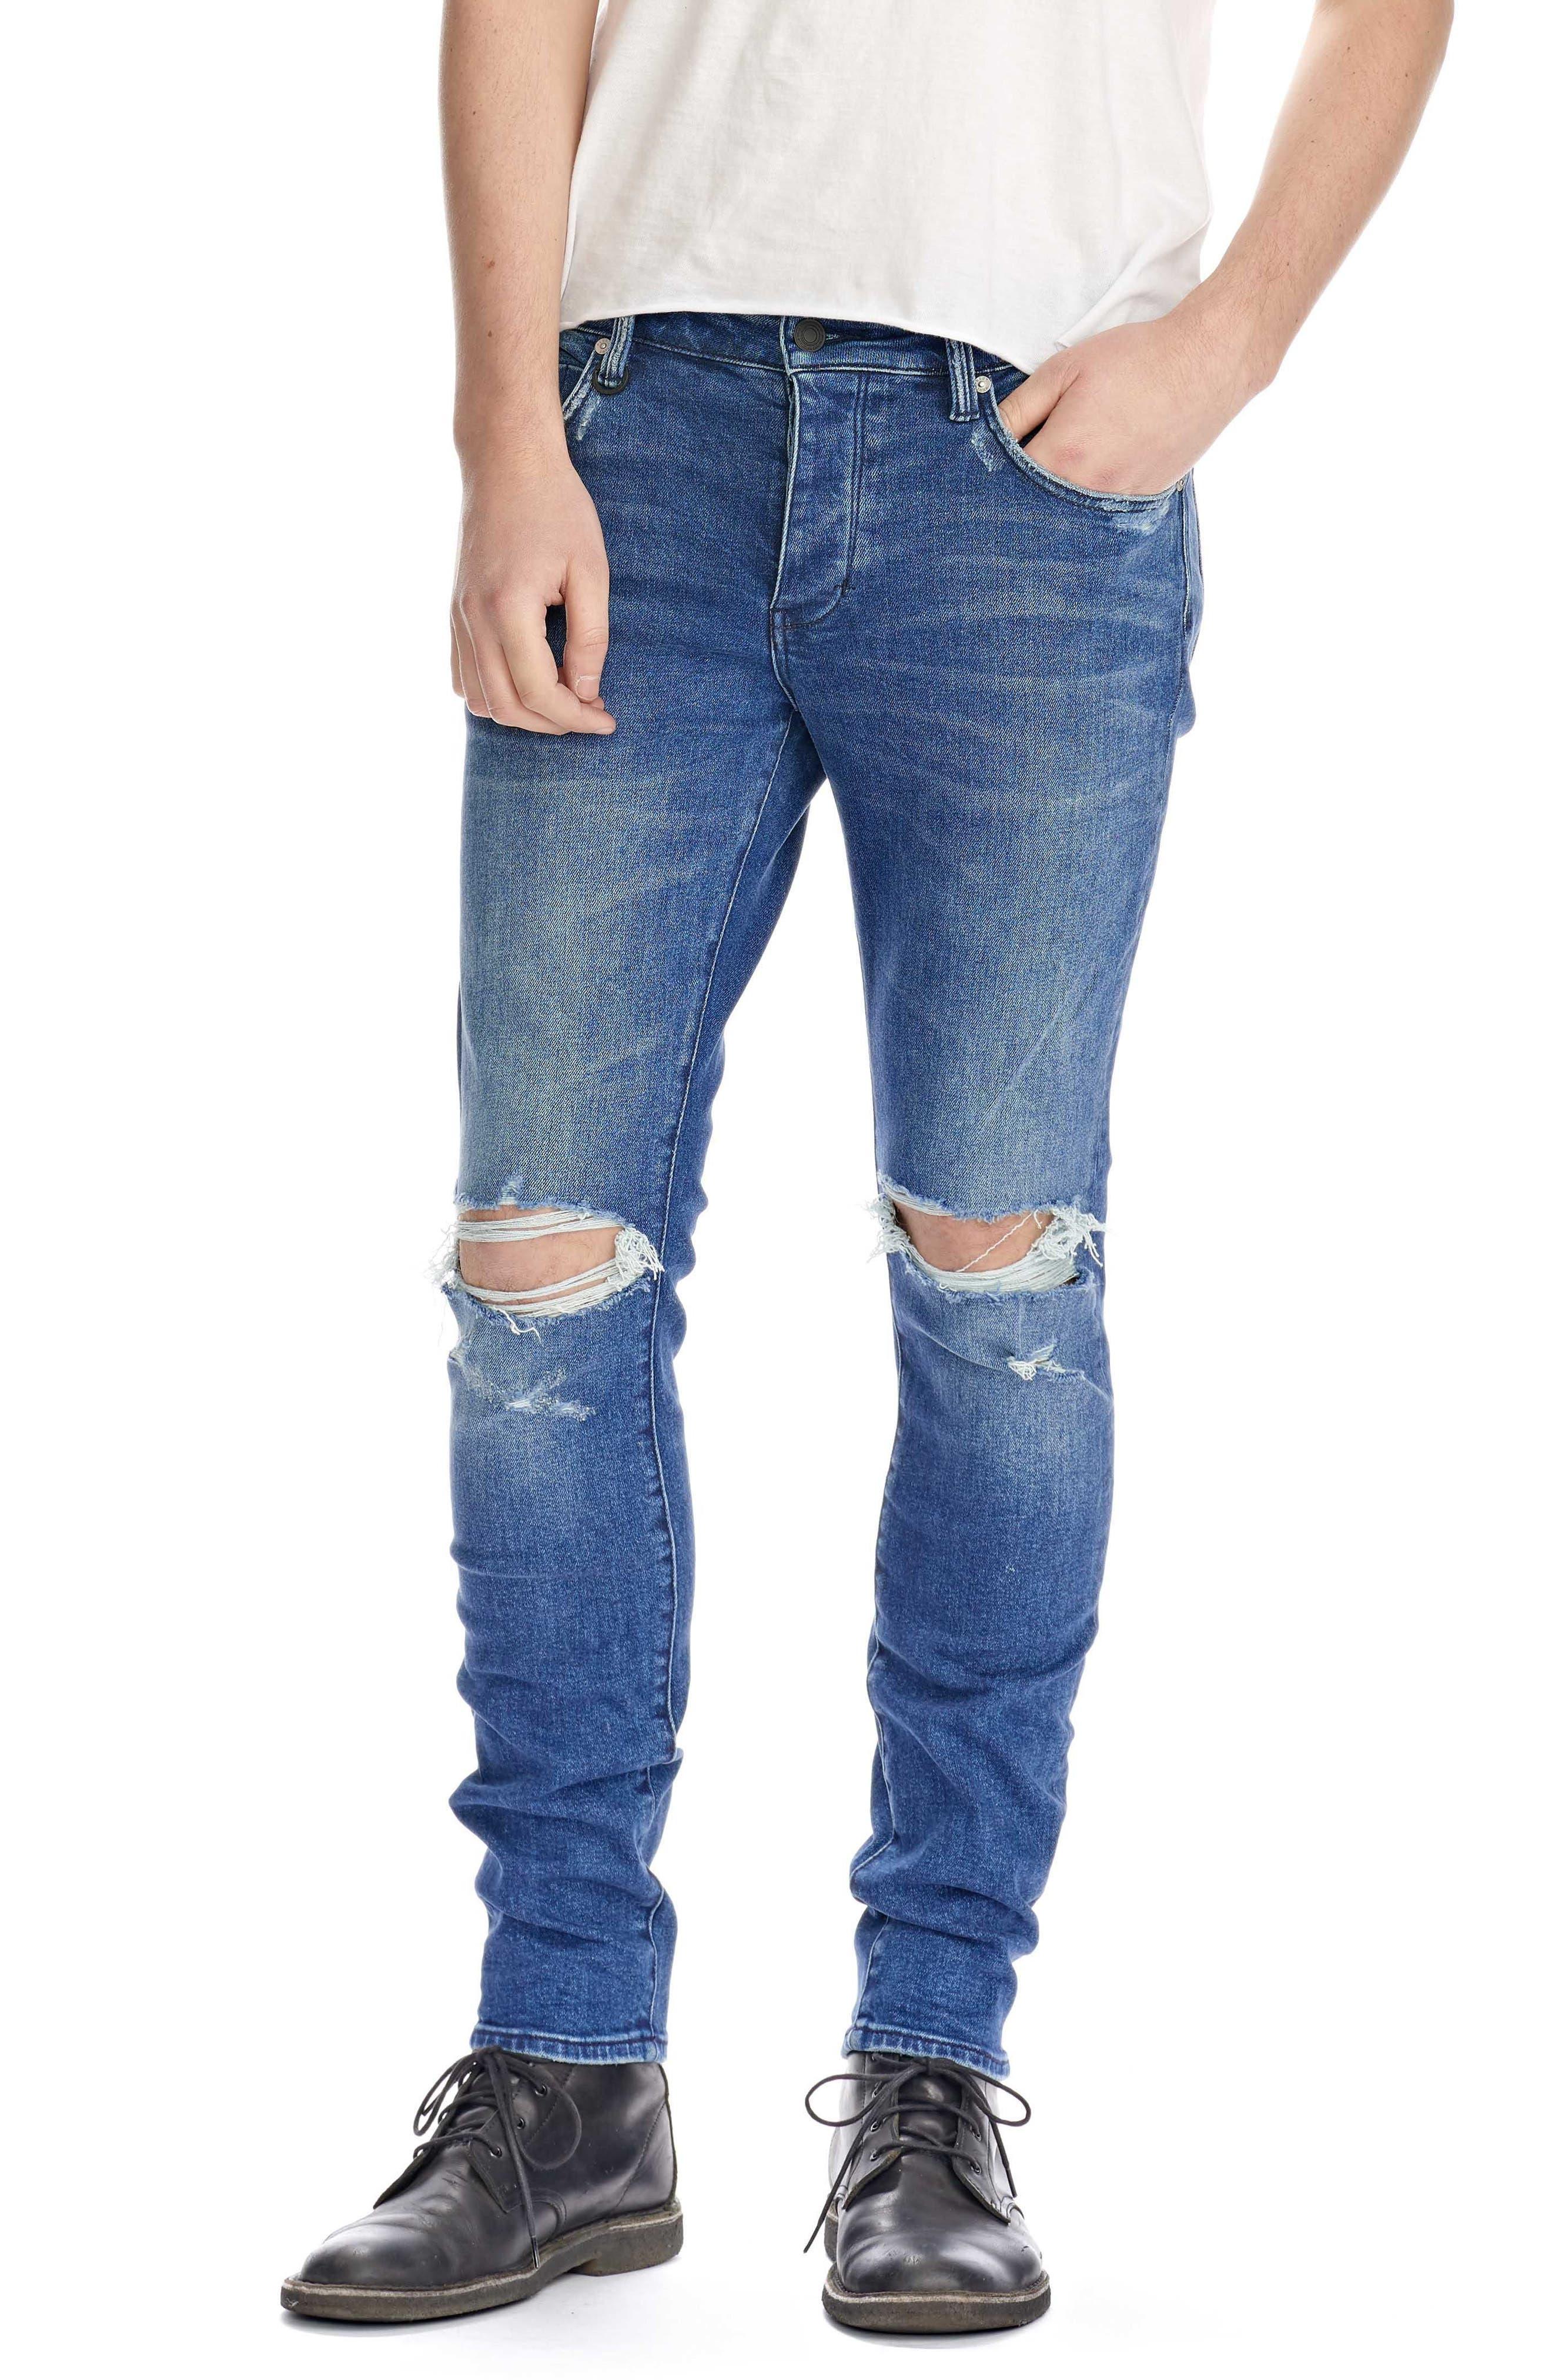 Alternate Image 1 Selected - NEUW Iggy Skinny Fit Jeans (Exodus)